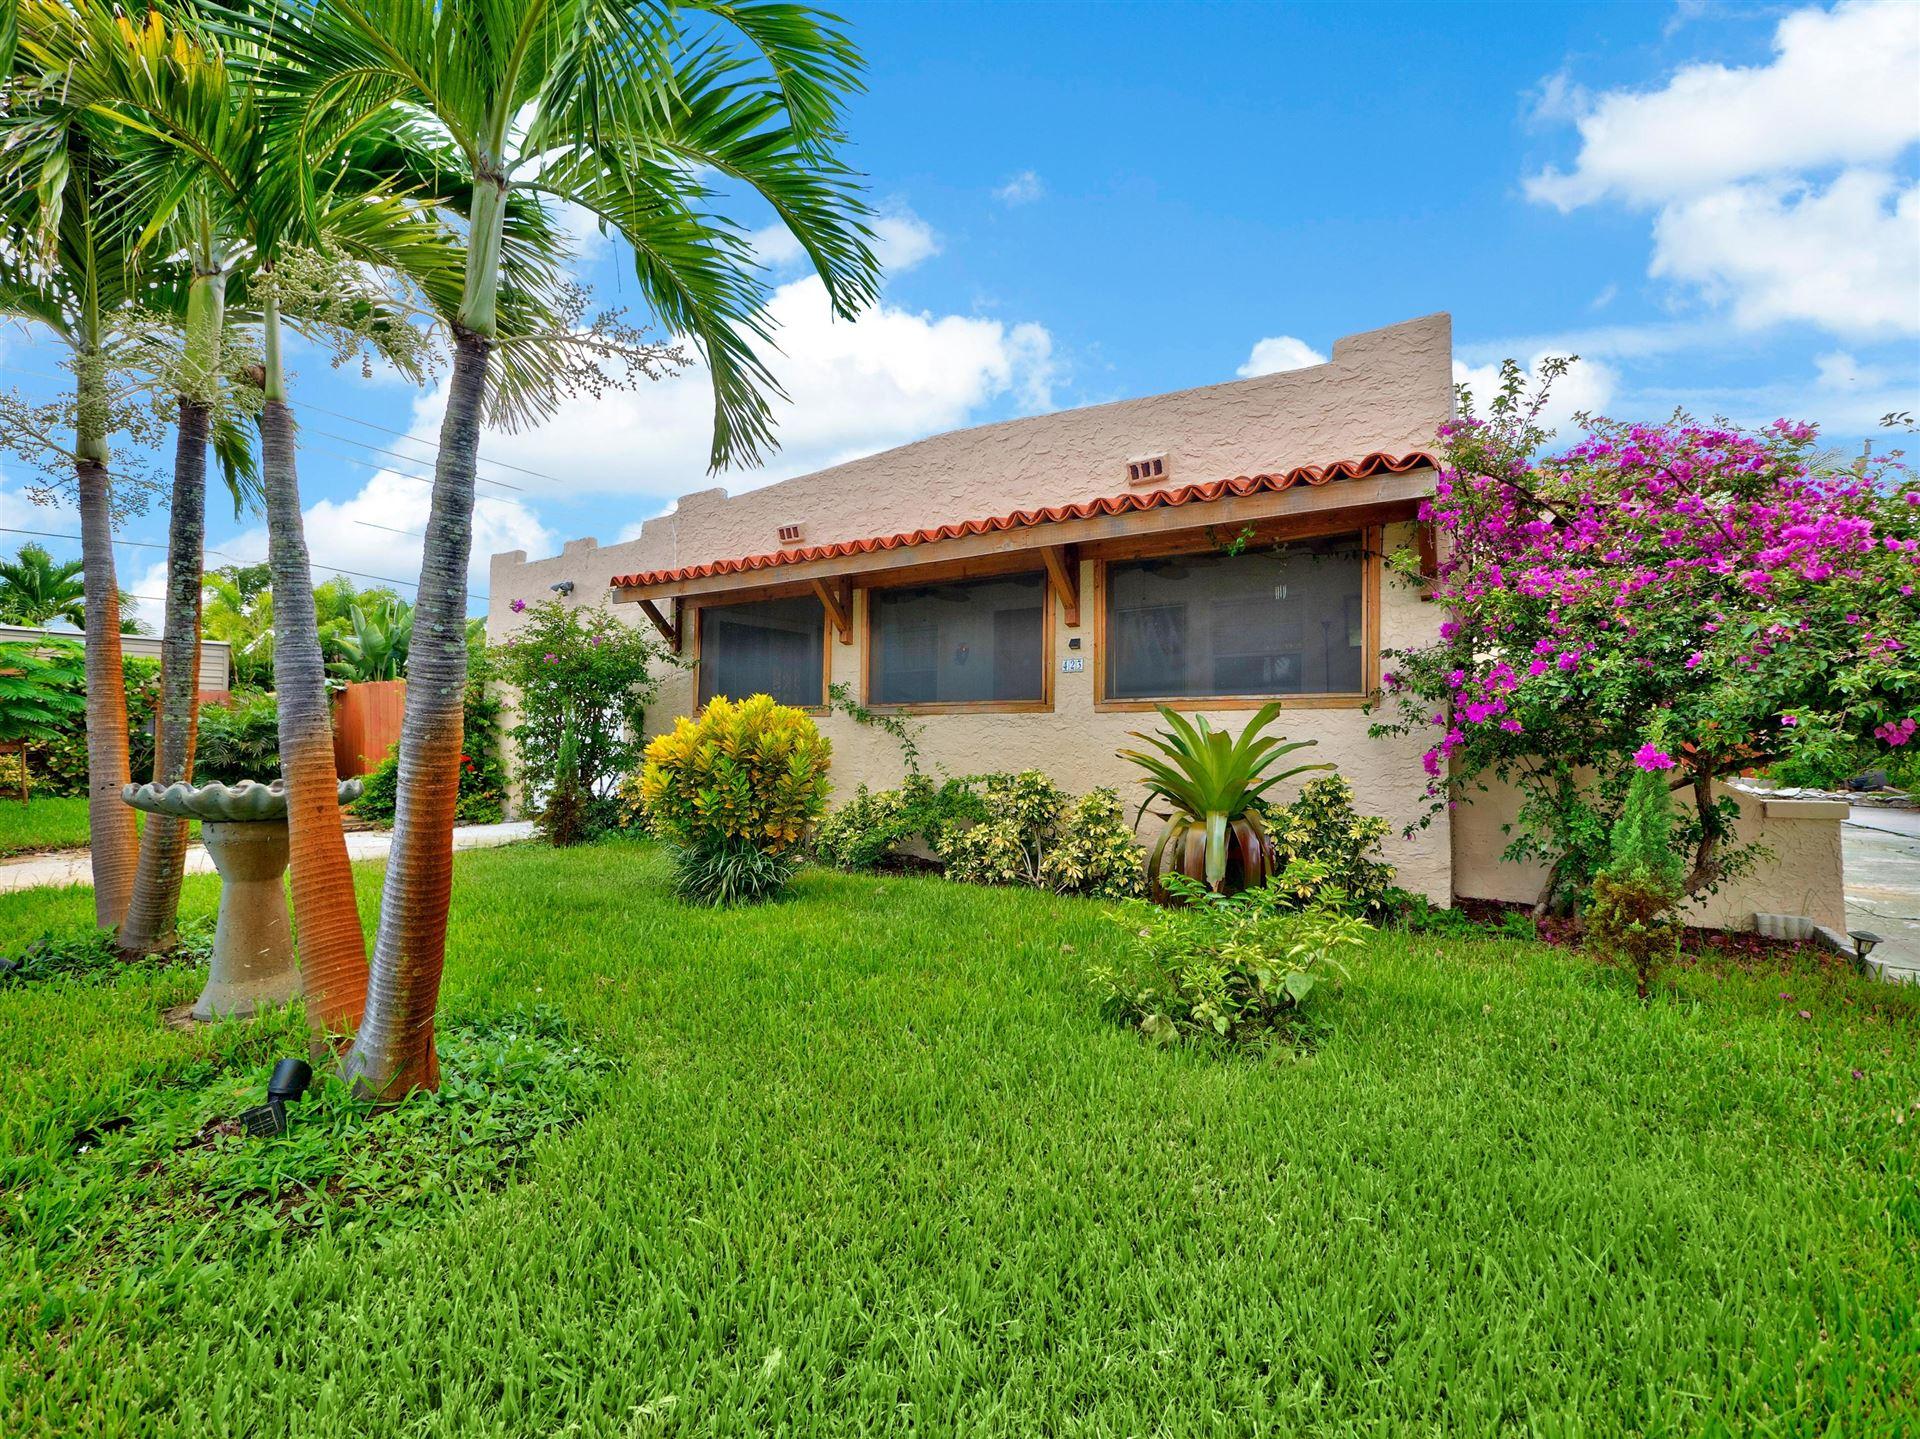 423 Oxford Street, West Palm Beach, FL 33405 - #: RX-10564825